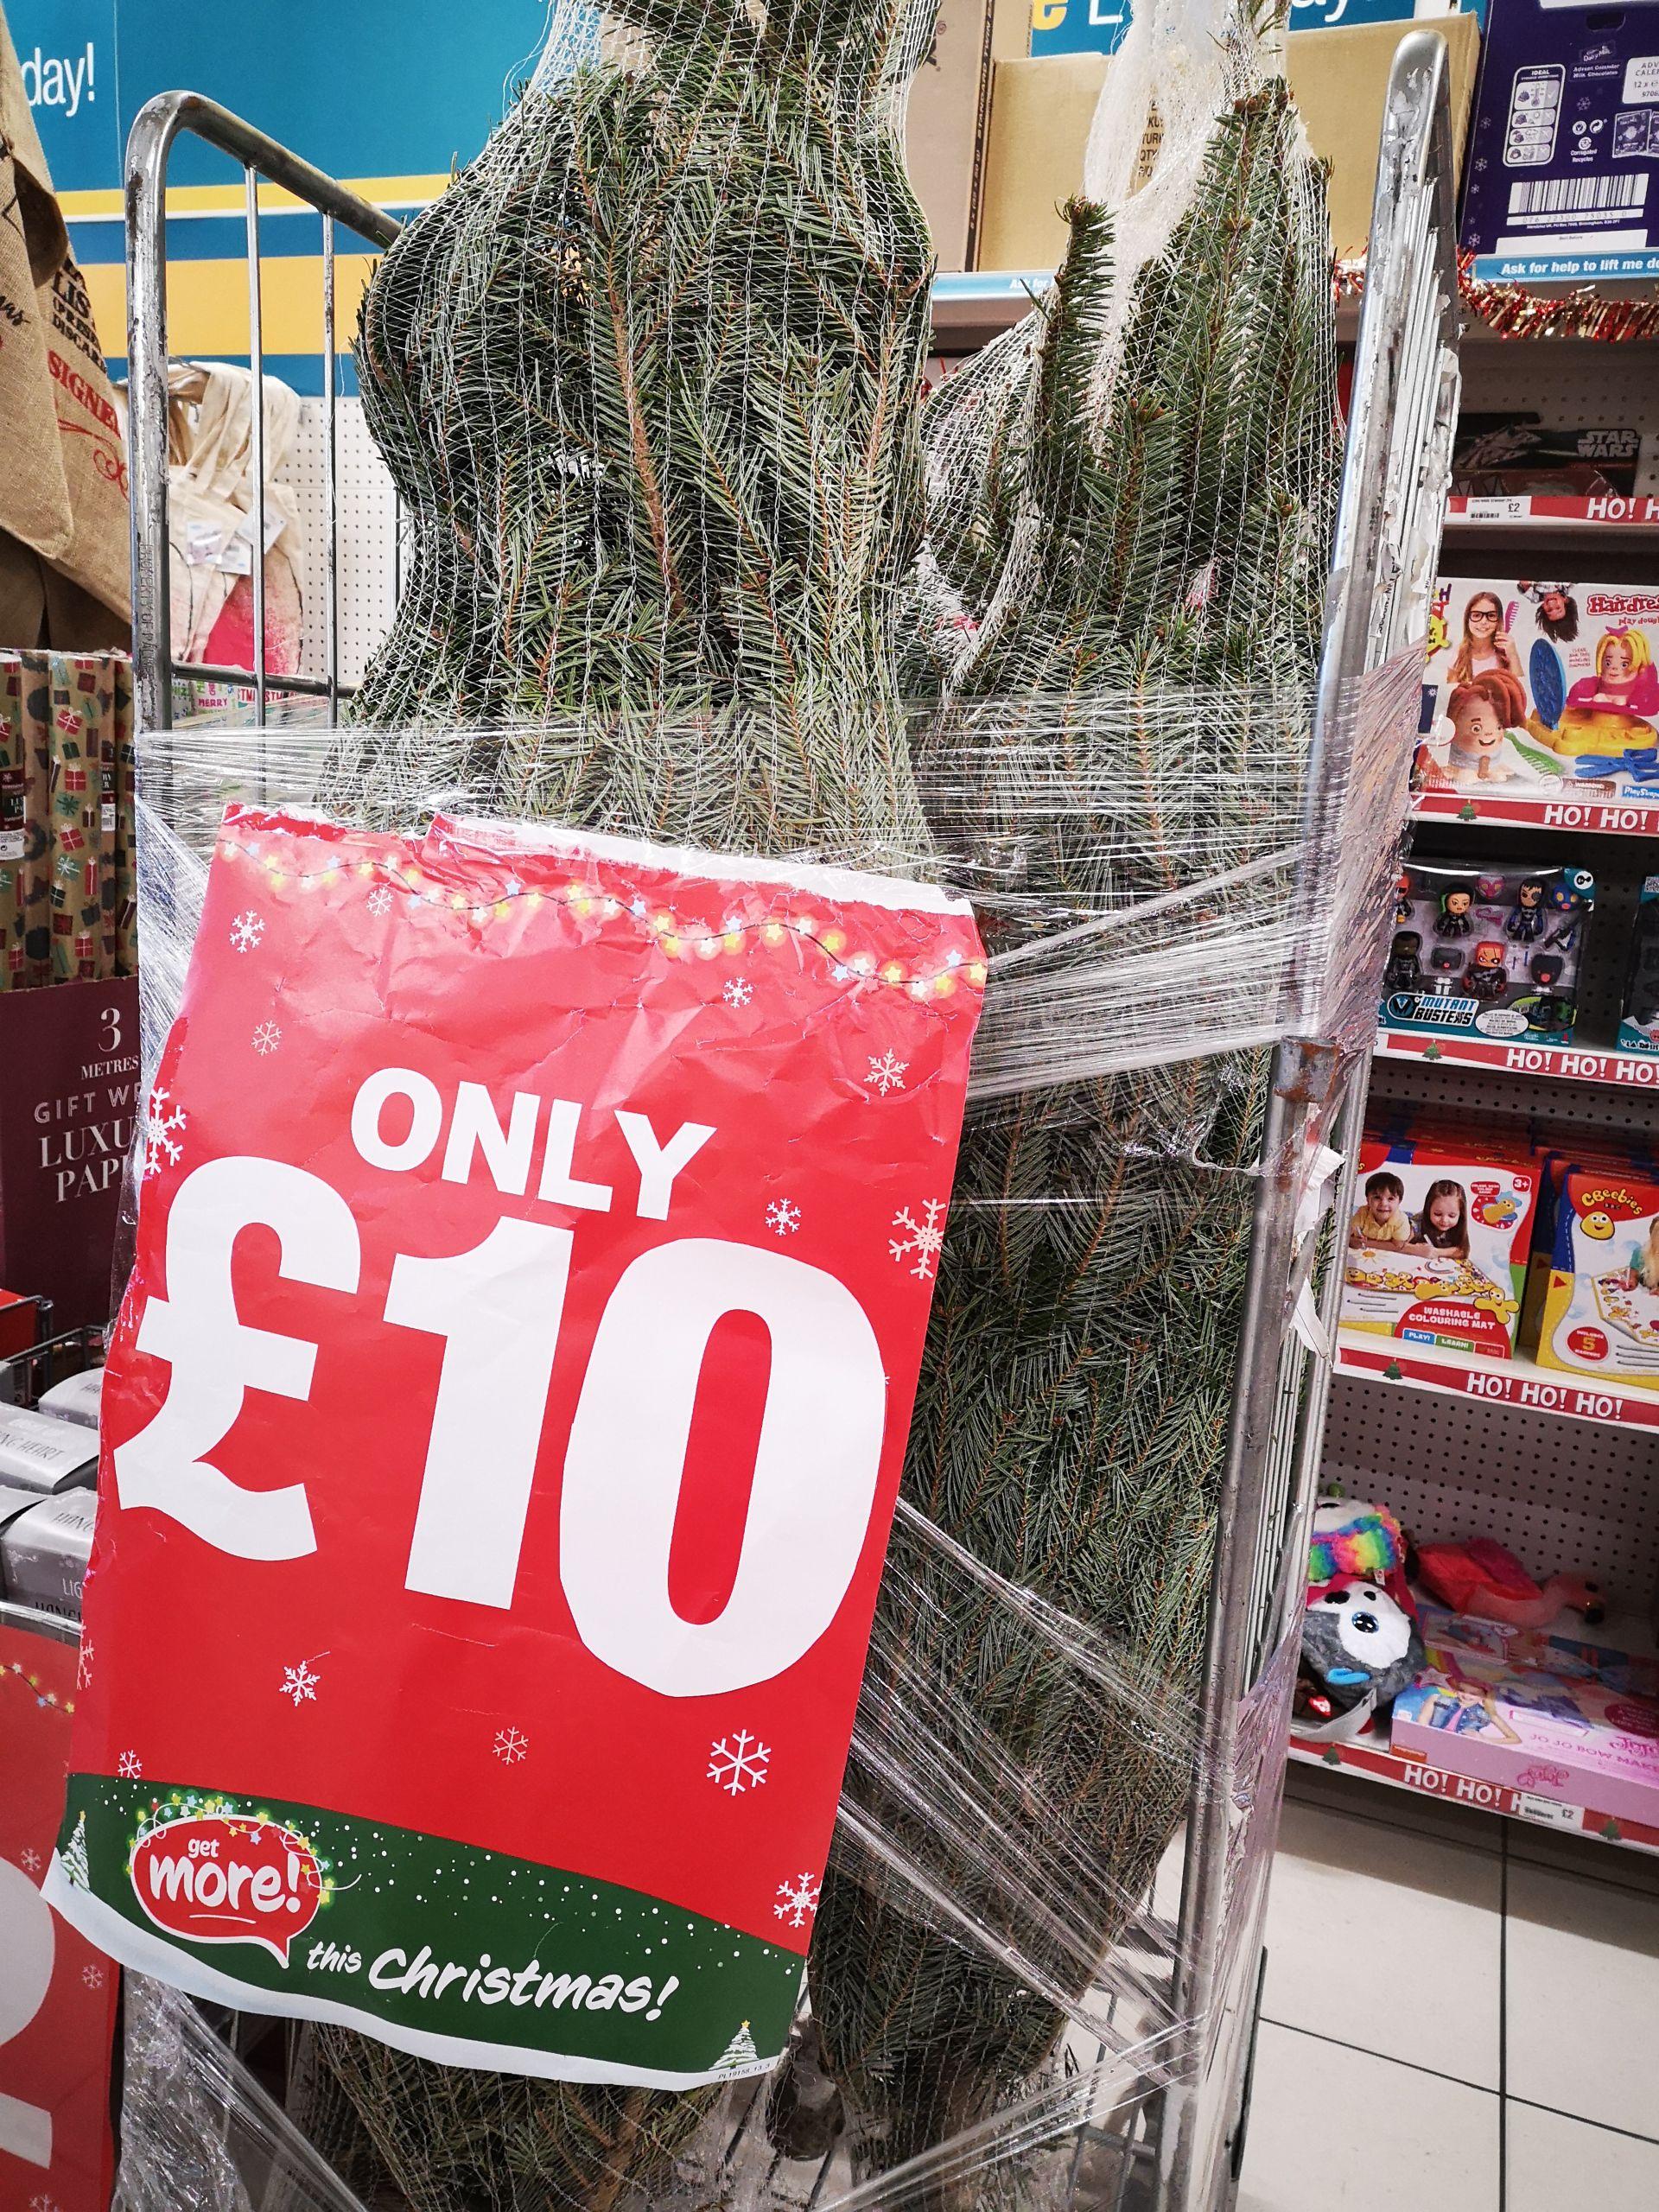 Real 6ft Christmas trees @ poundland (Macclesfield) - £10